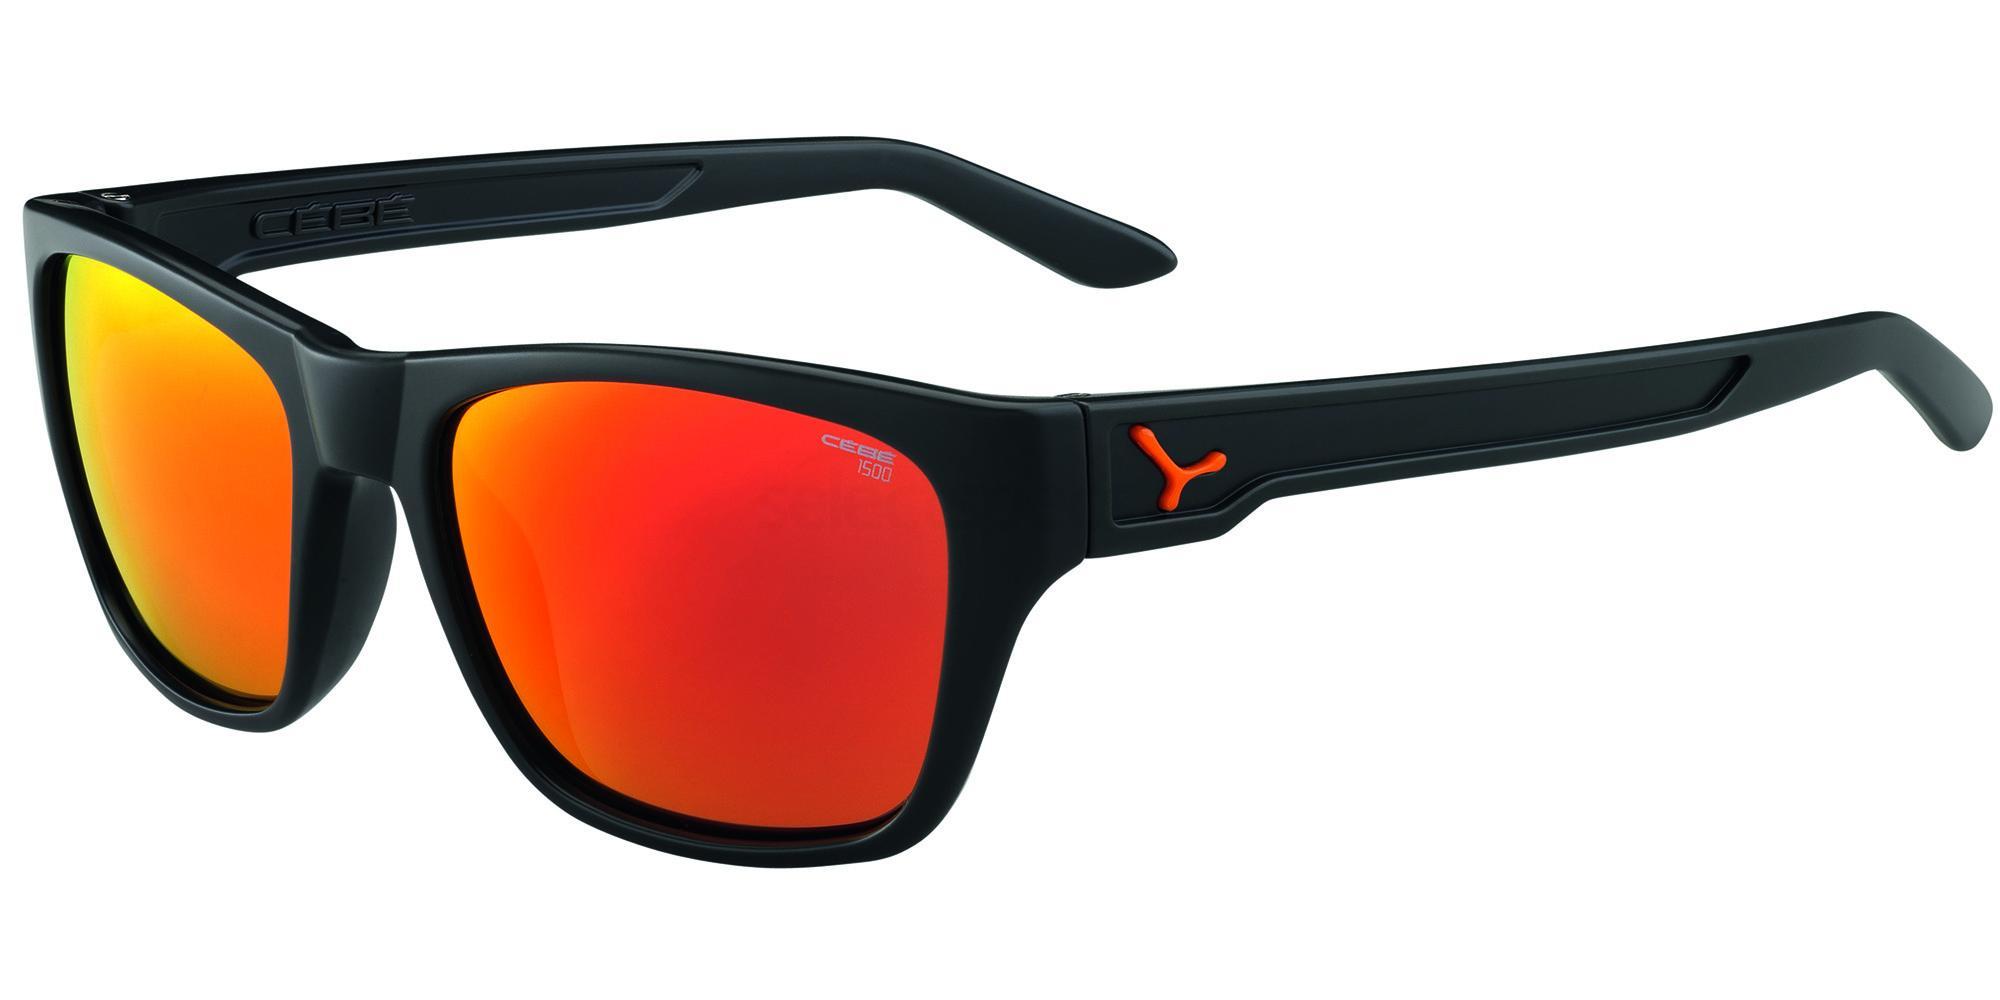 CBHACK1 Hacker (Medium Fit) Sunglasses, Cebe